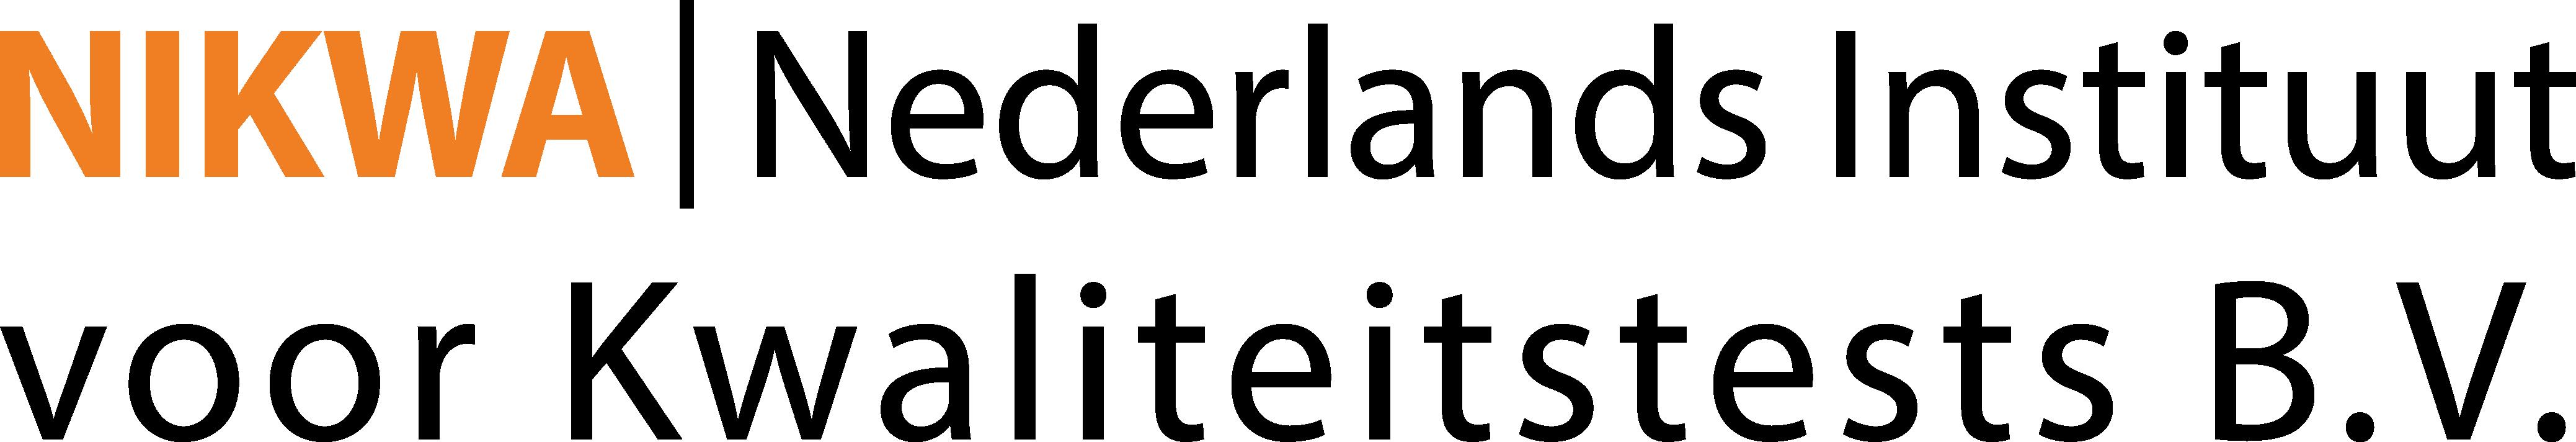 NIKWA